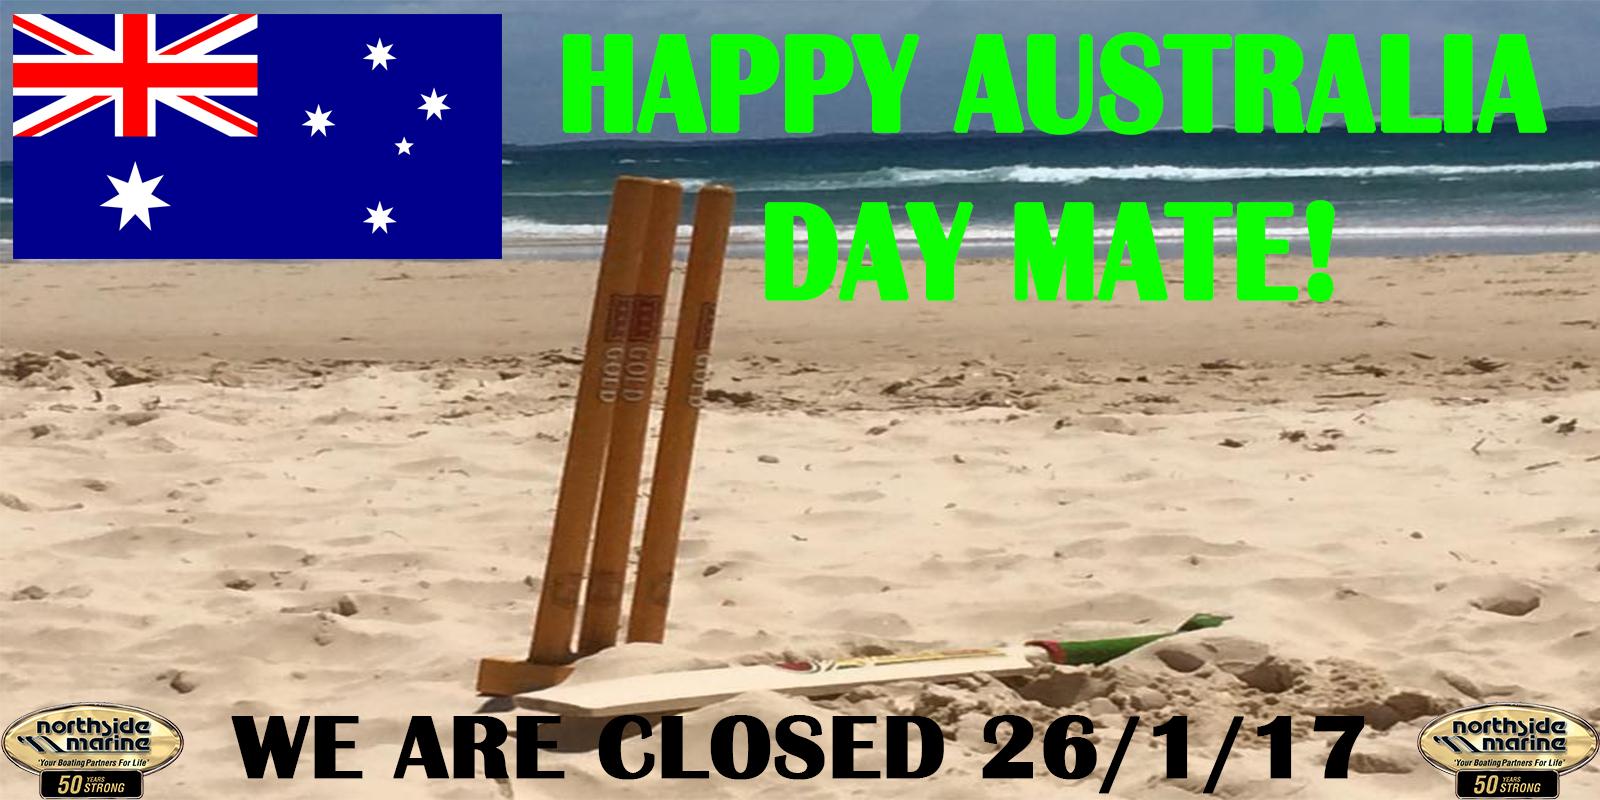 14.AustraliaDay-NorthsideMarine-Closed-26-1-17